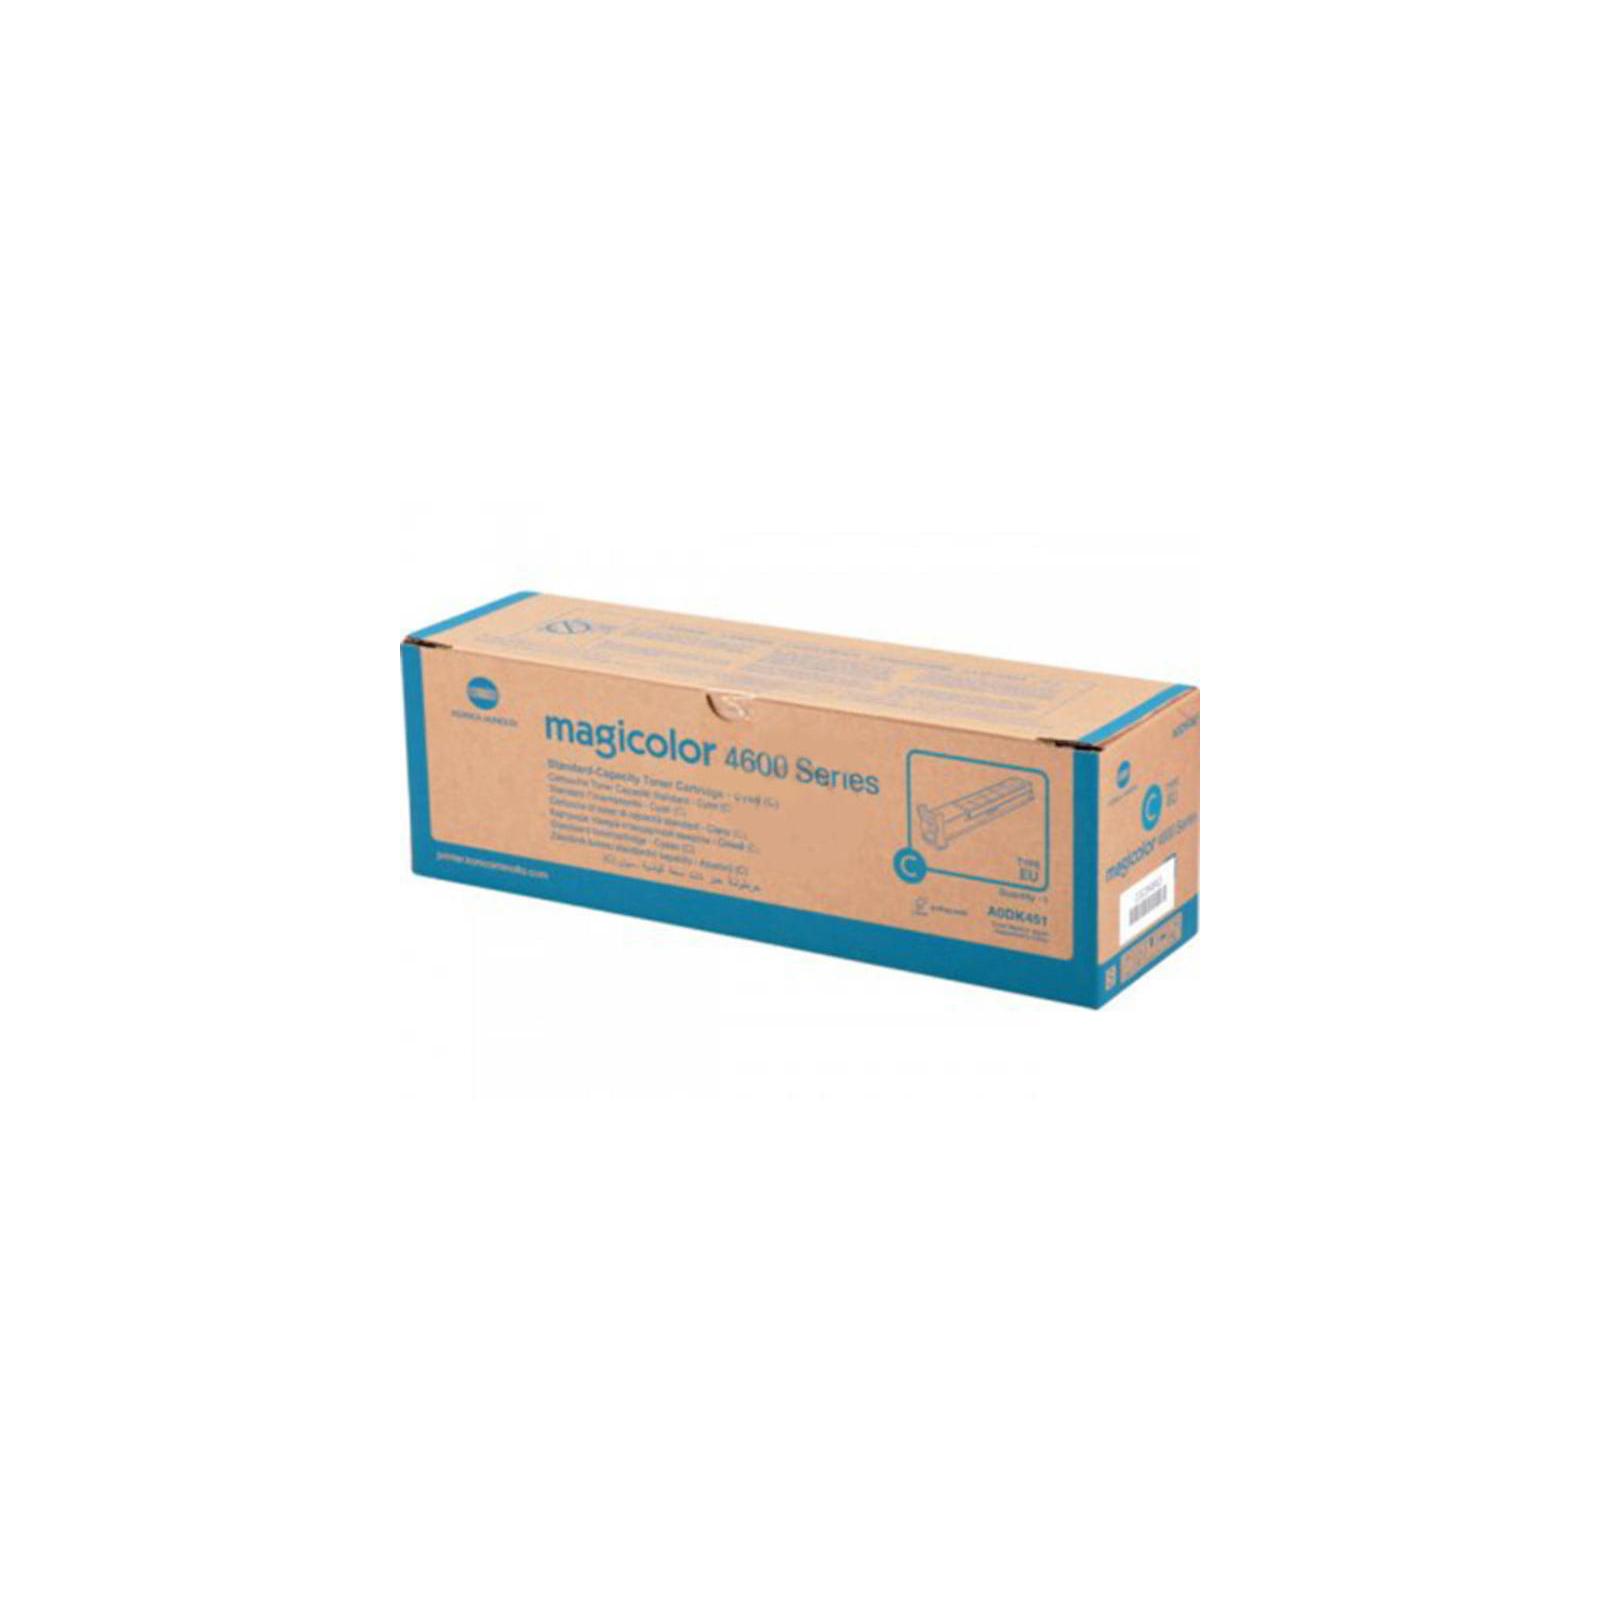 Тонер-картридж KONICA MINOLTA MagiColor 4600 Series (Cyan) 4К (A0DK451)